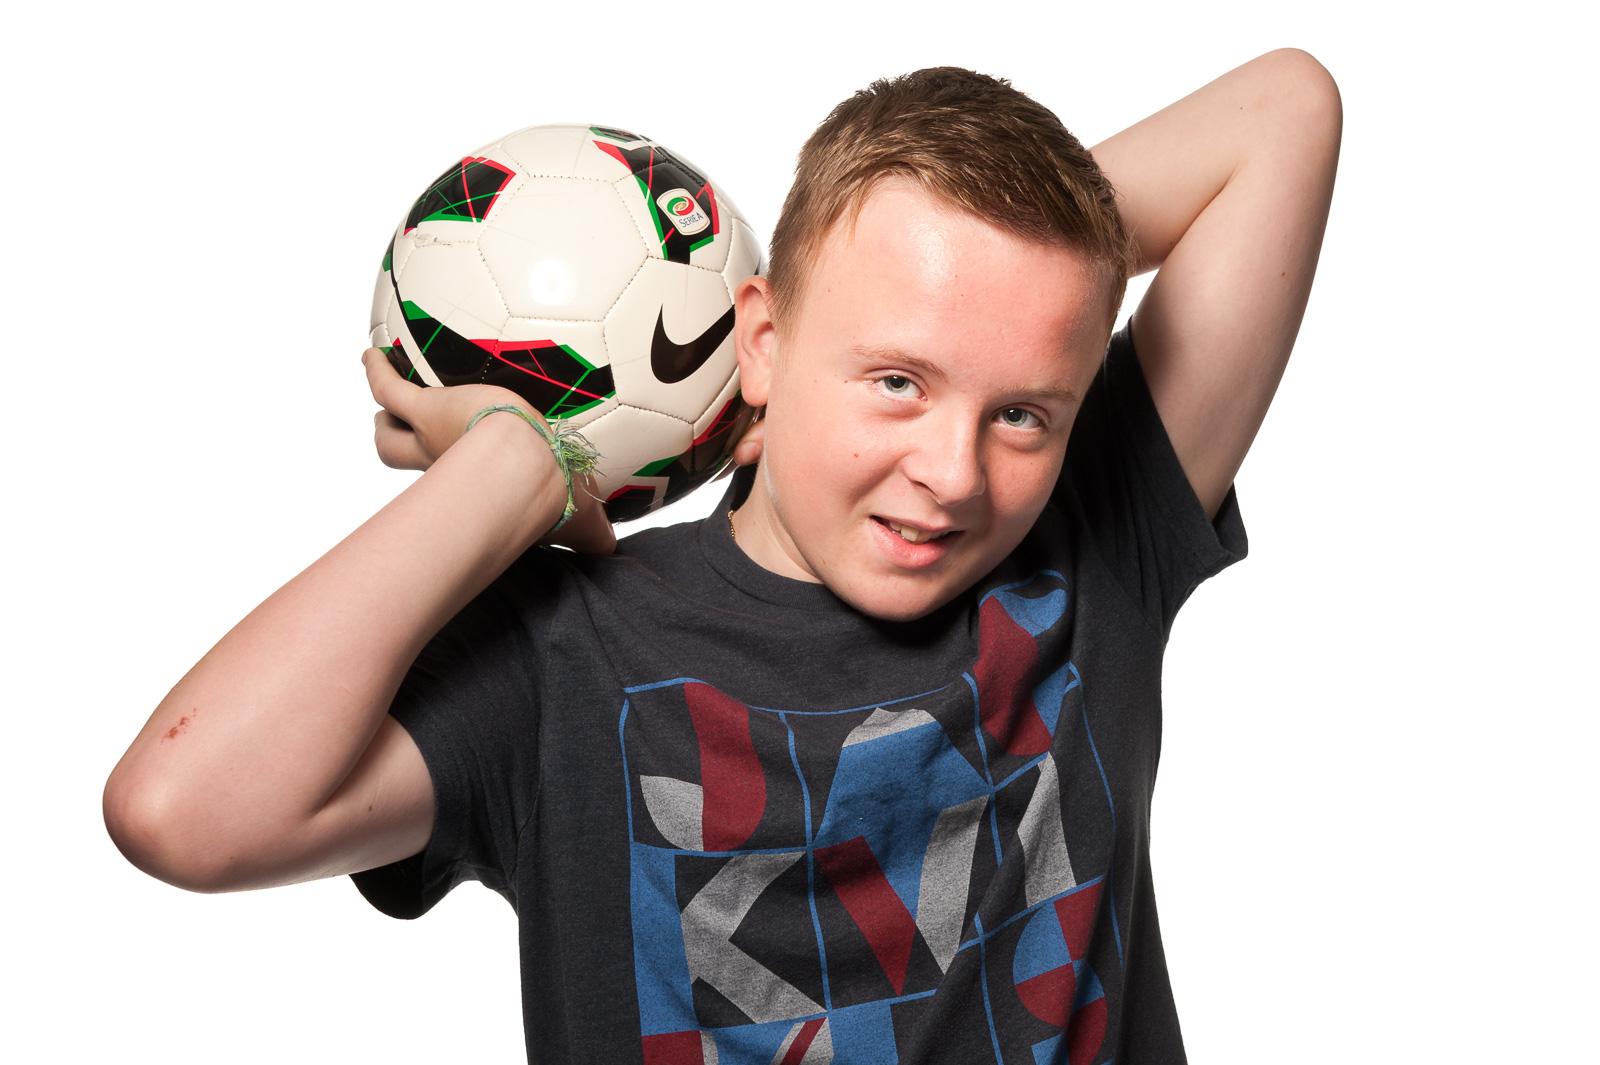 portrait photographer, portrait photography derby, Studio family portrait of a teenage boy with a football